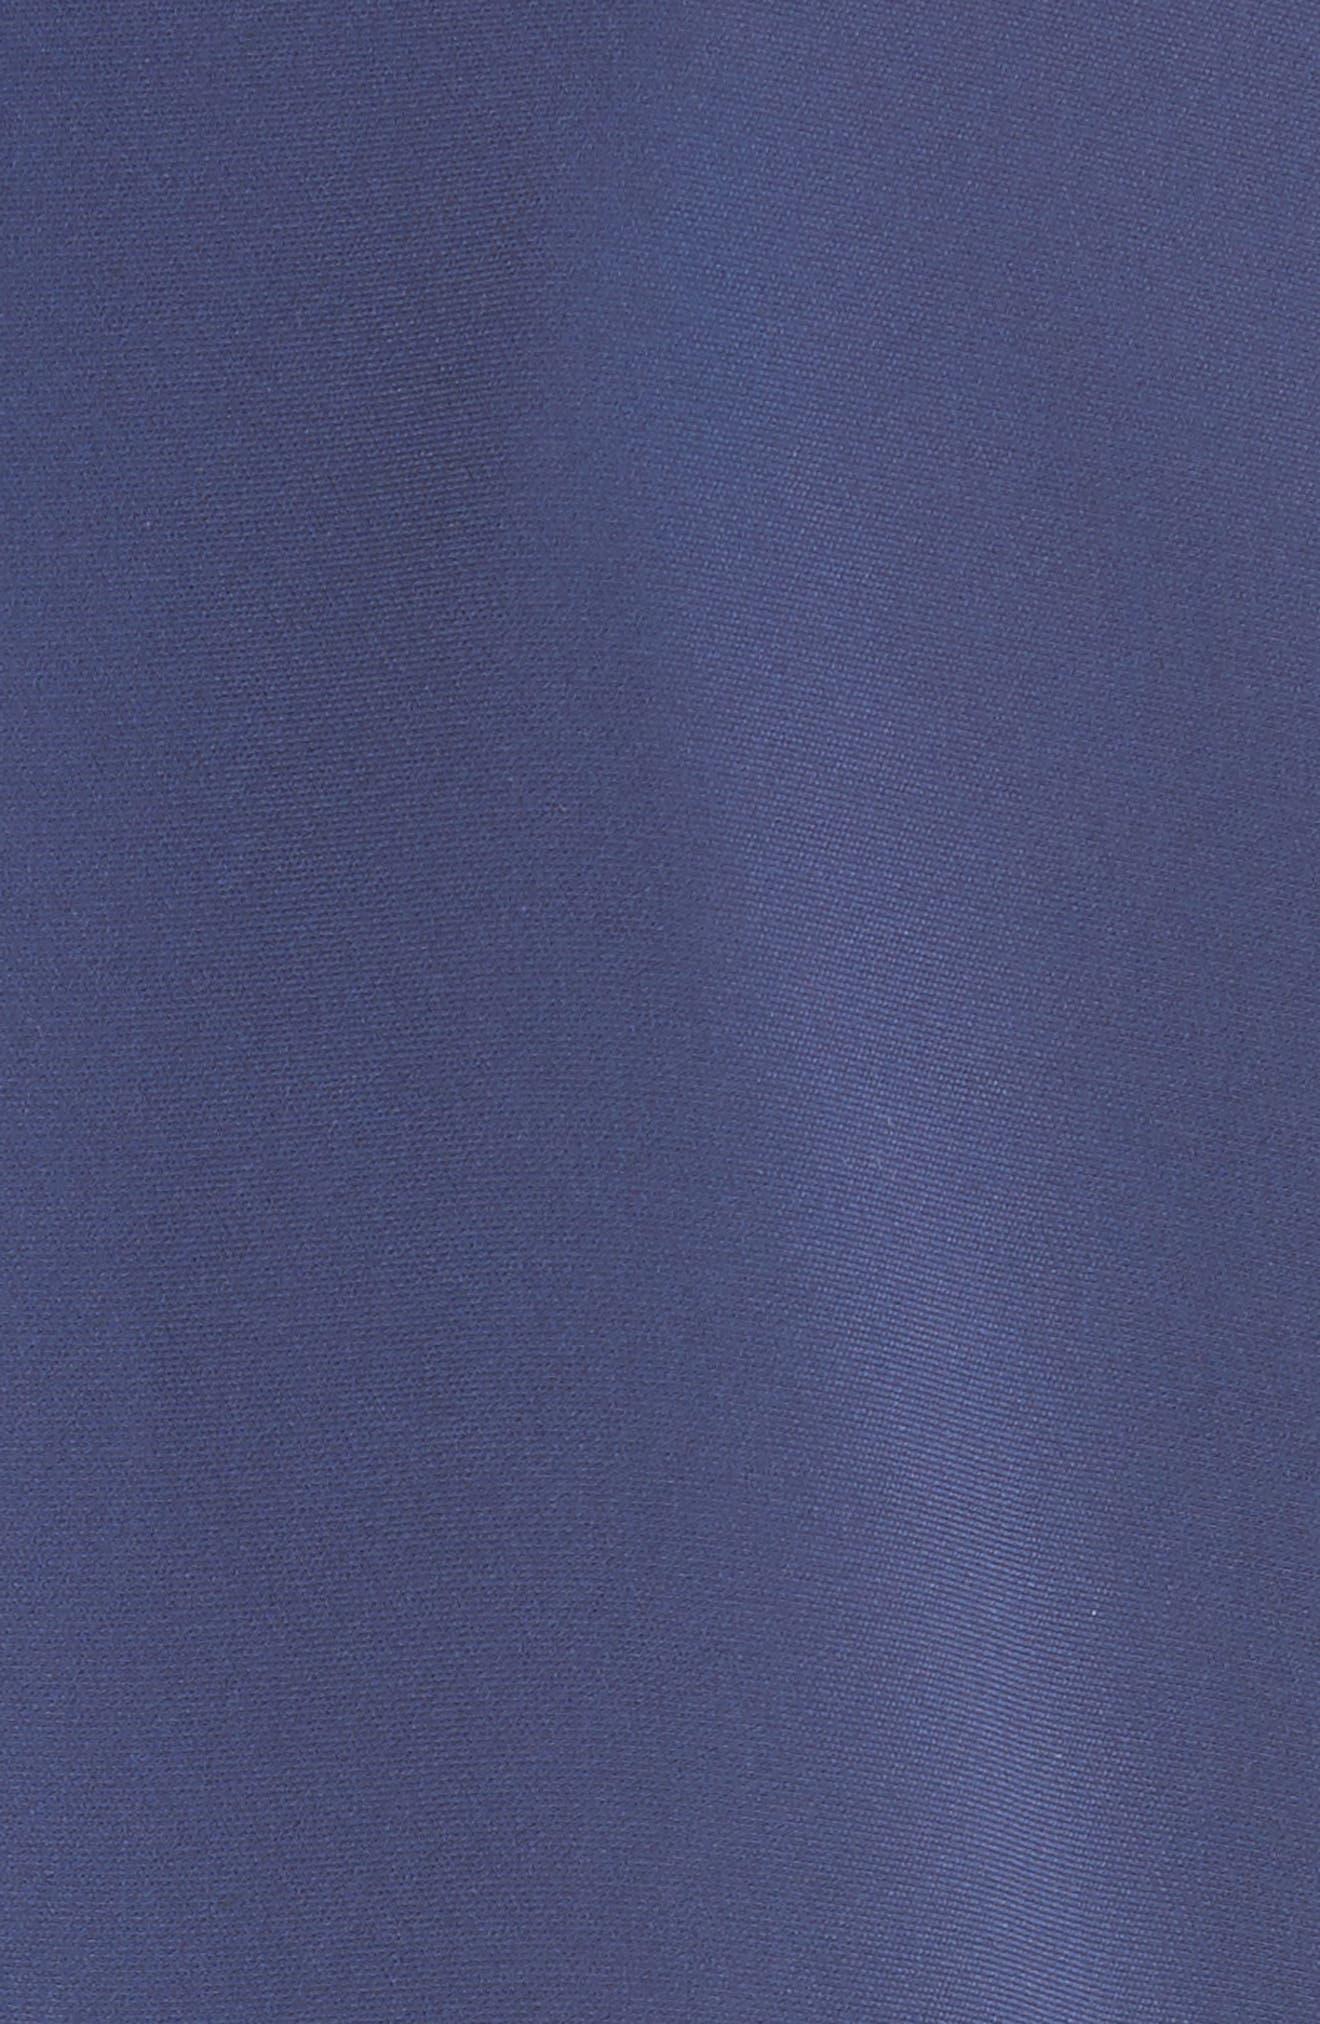 Alternate Image 3  - Max Mara Shift Dress